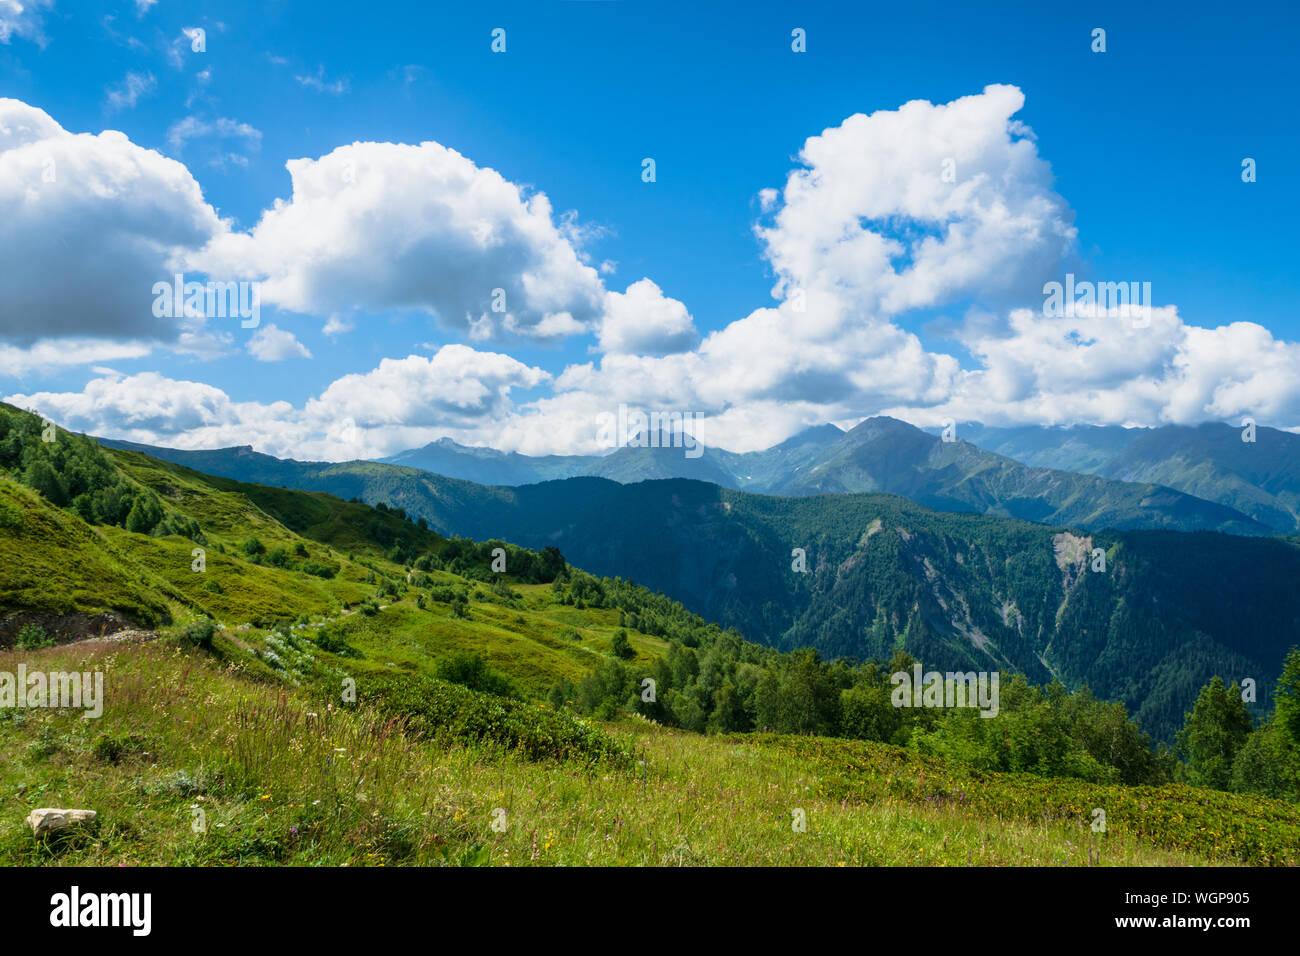 Svaneti landscape with mountains on the trekking and hiking route near Mestia village in Svaneti region, Georgia. Stock Photo